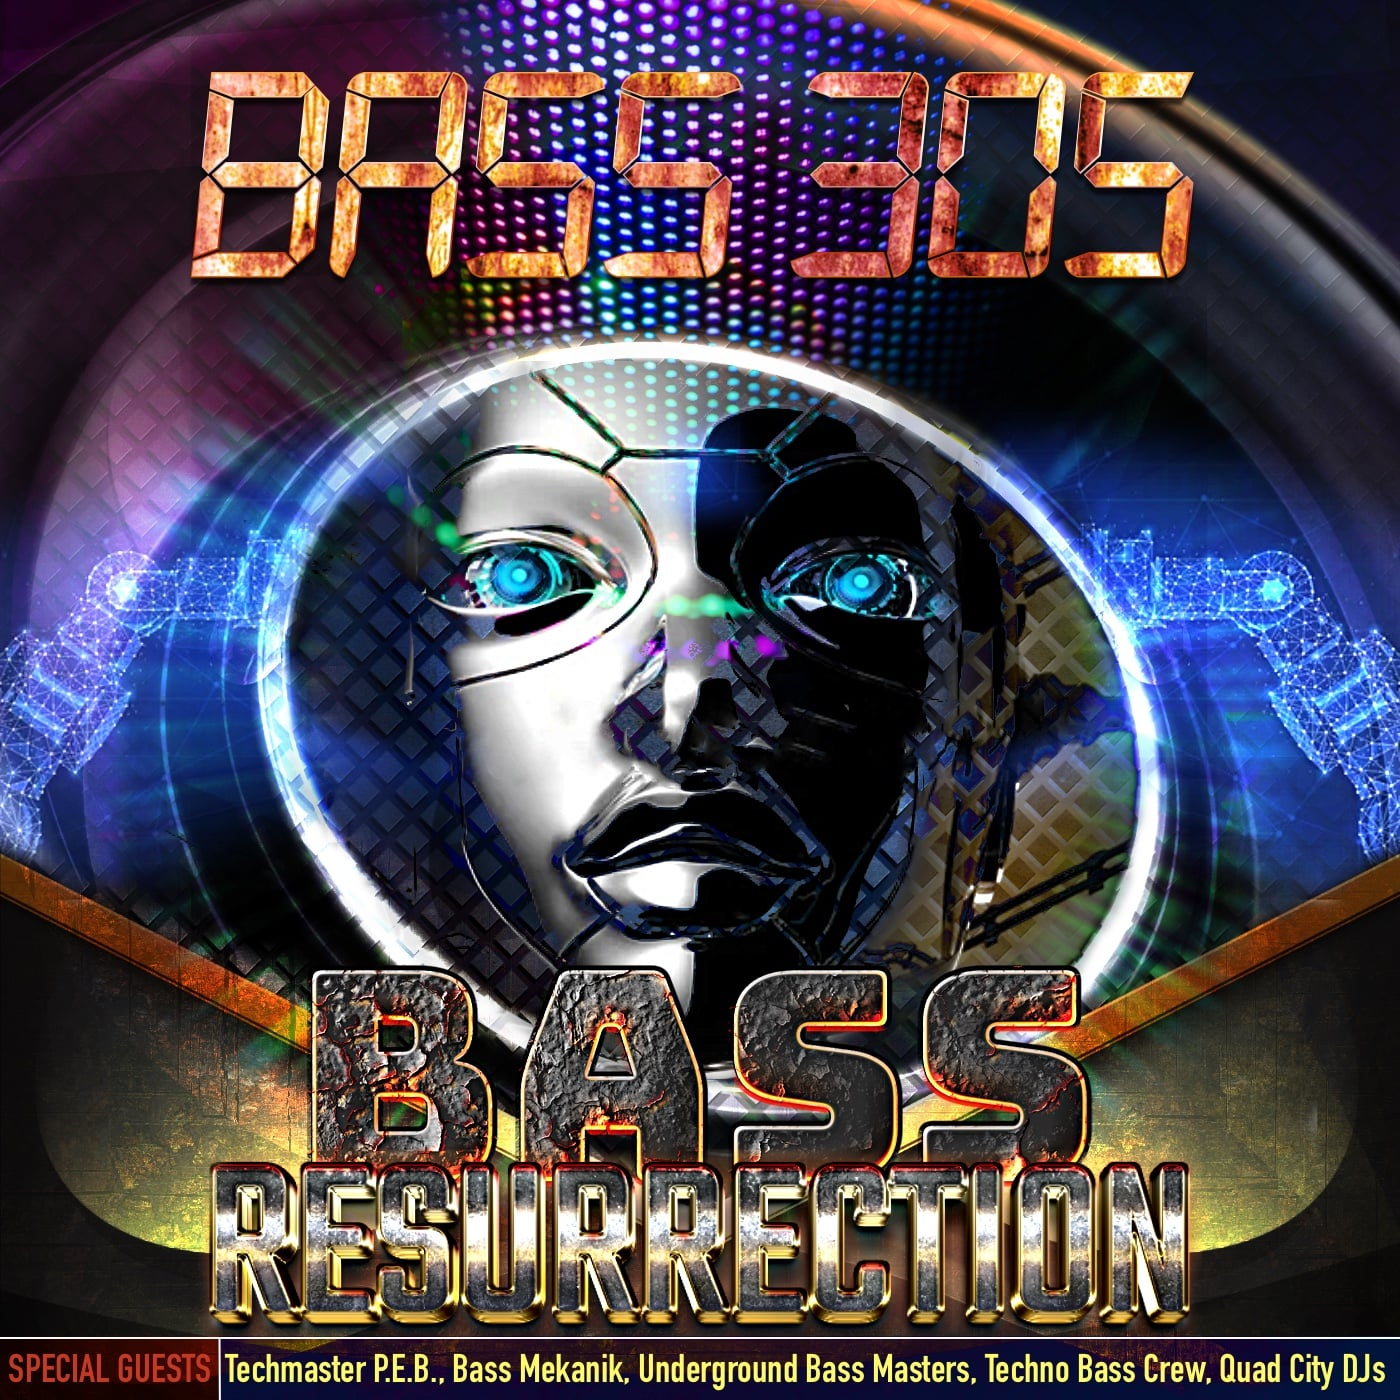 the tracklist of Bass 305's Bass Resurrection album